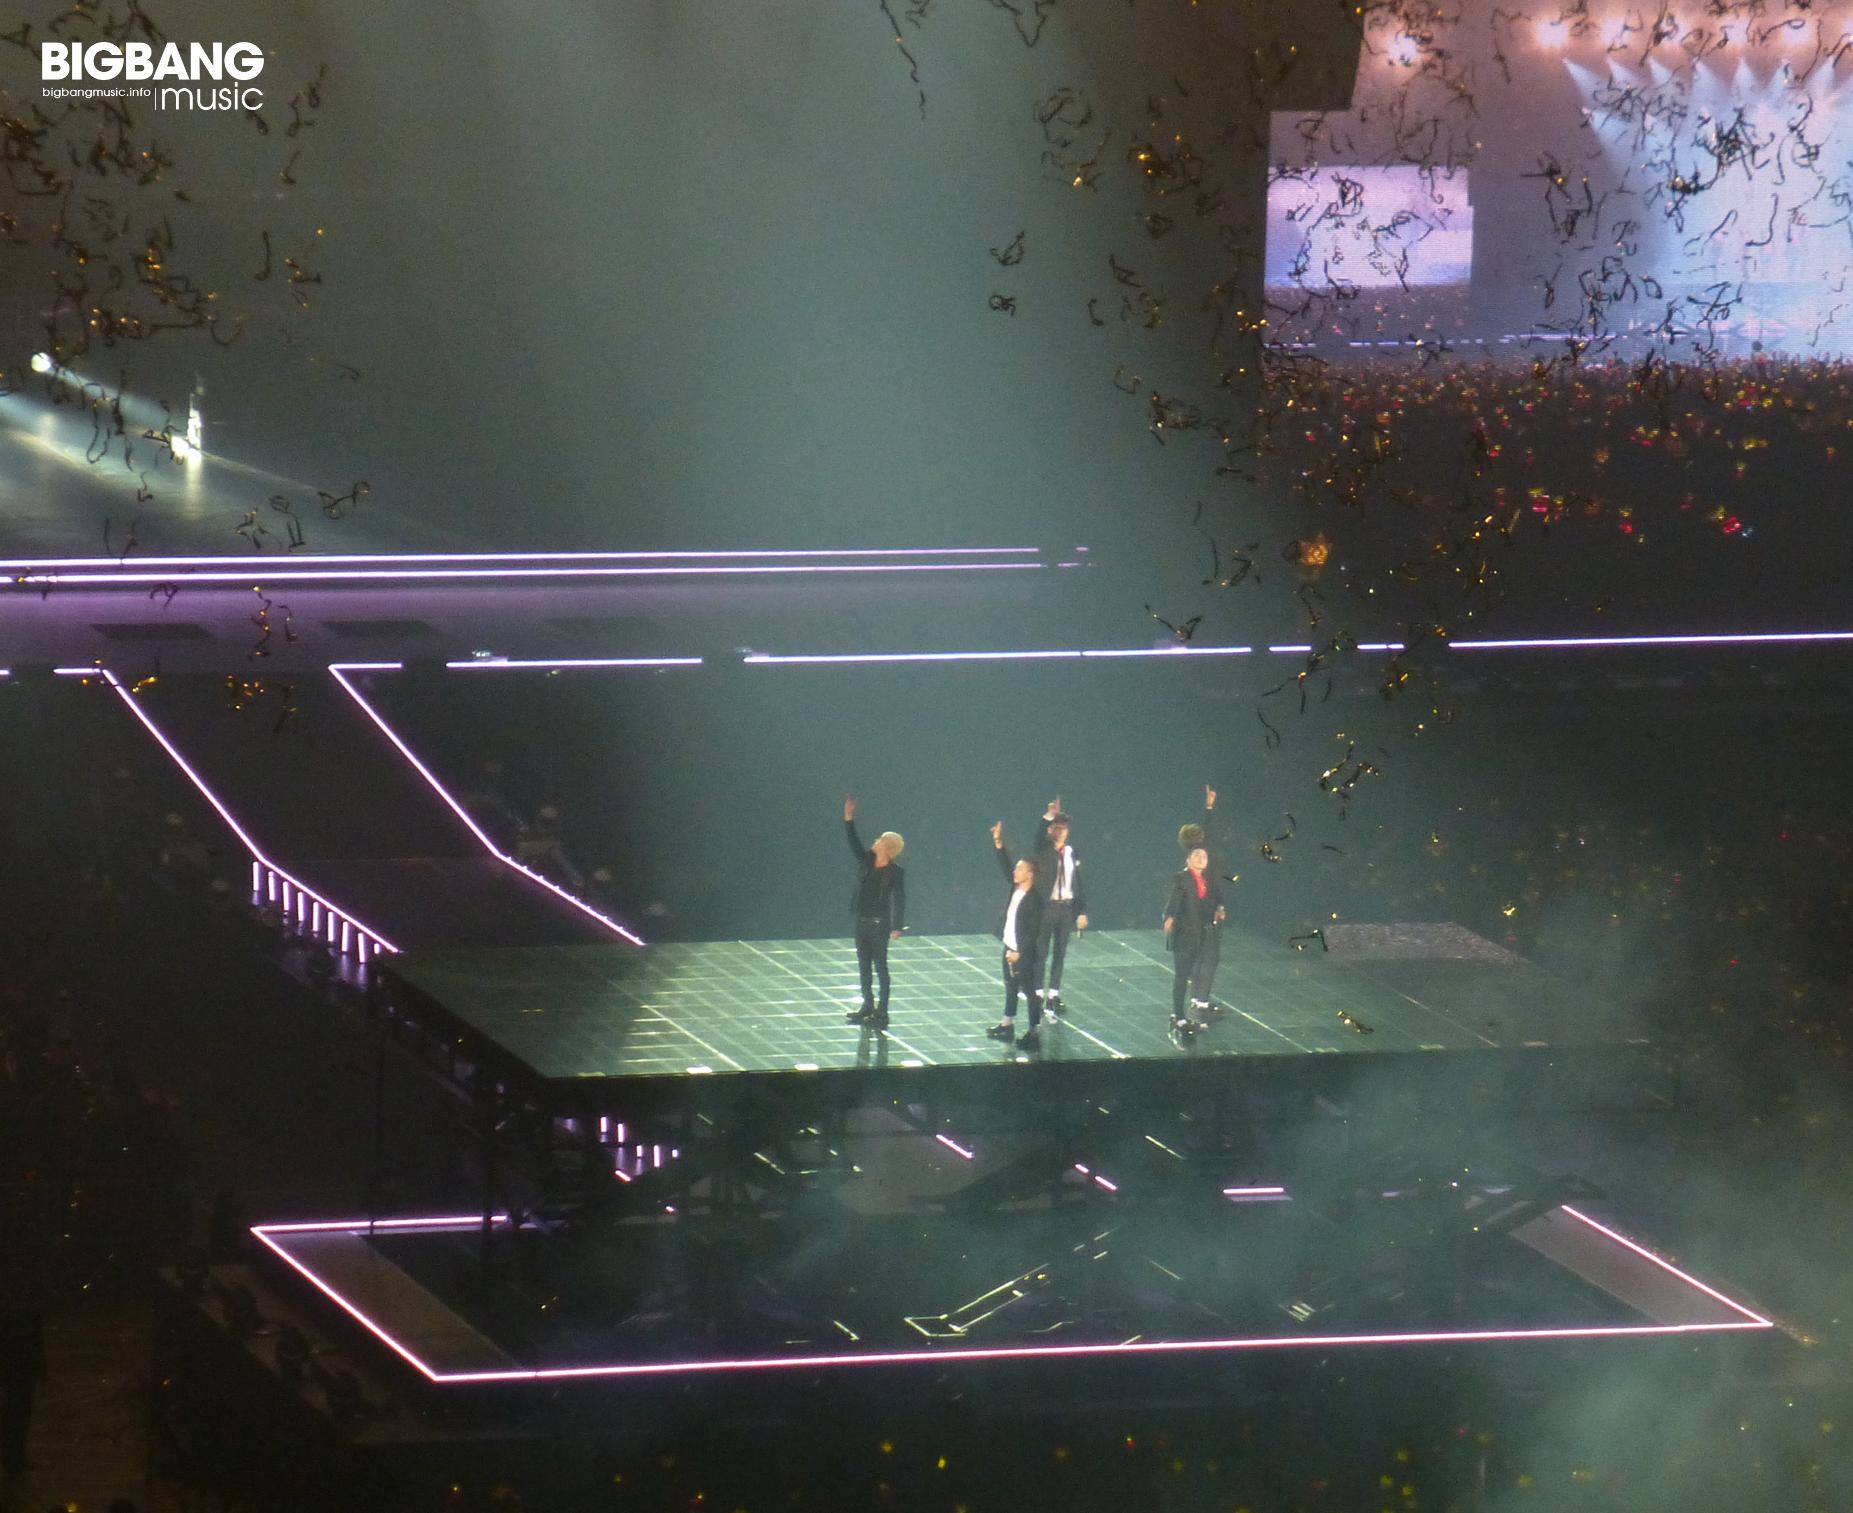 BIGBANG-Osaka-Day-5-2016-01-10-BIGBANG-01.jpg